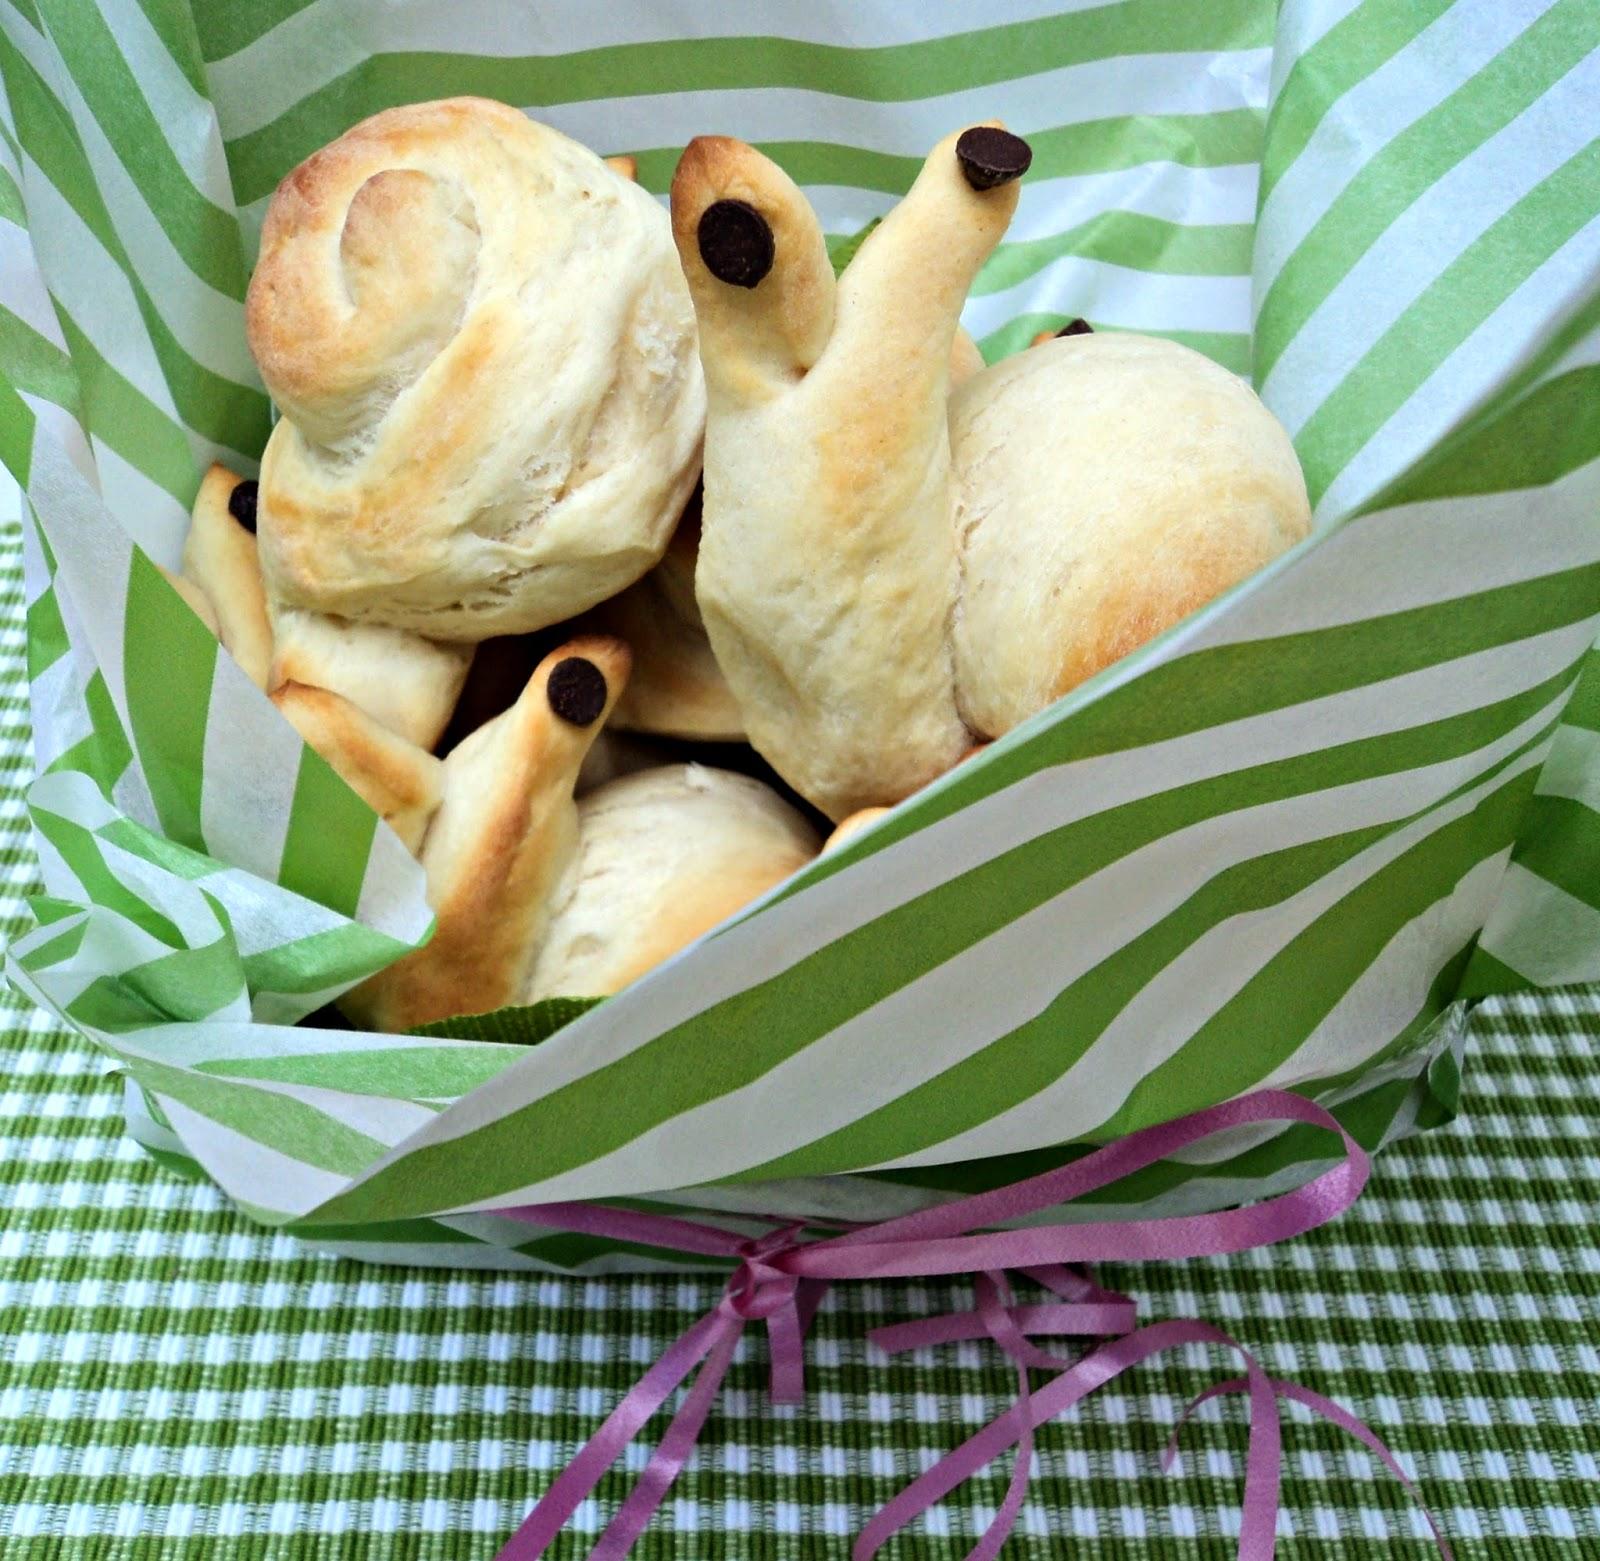 Receta de bollitos de pan en forma de caracoles